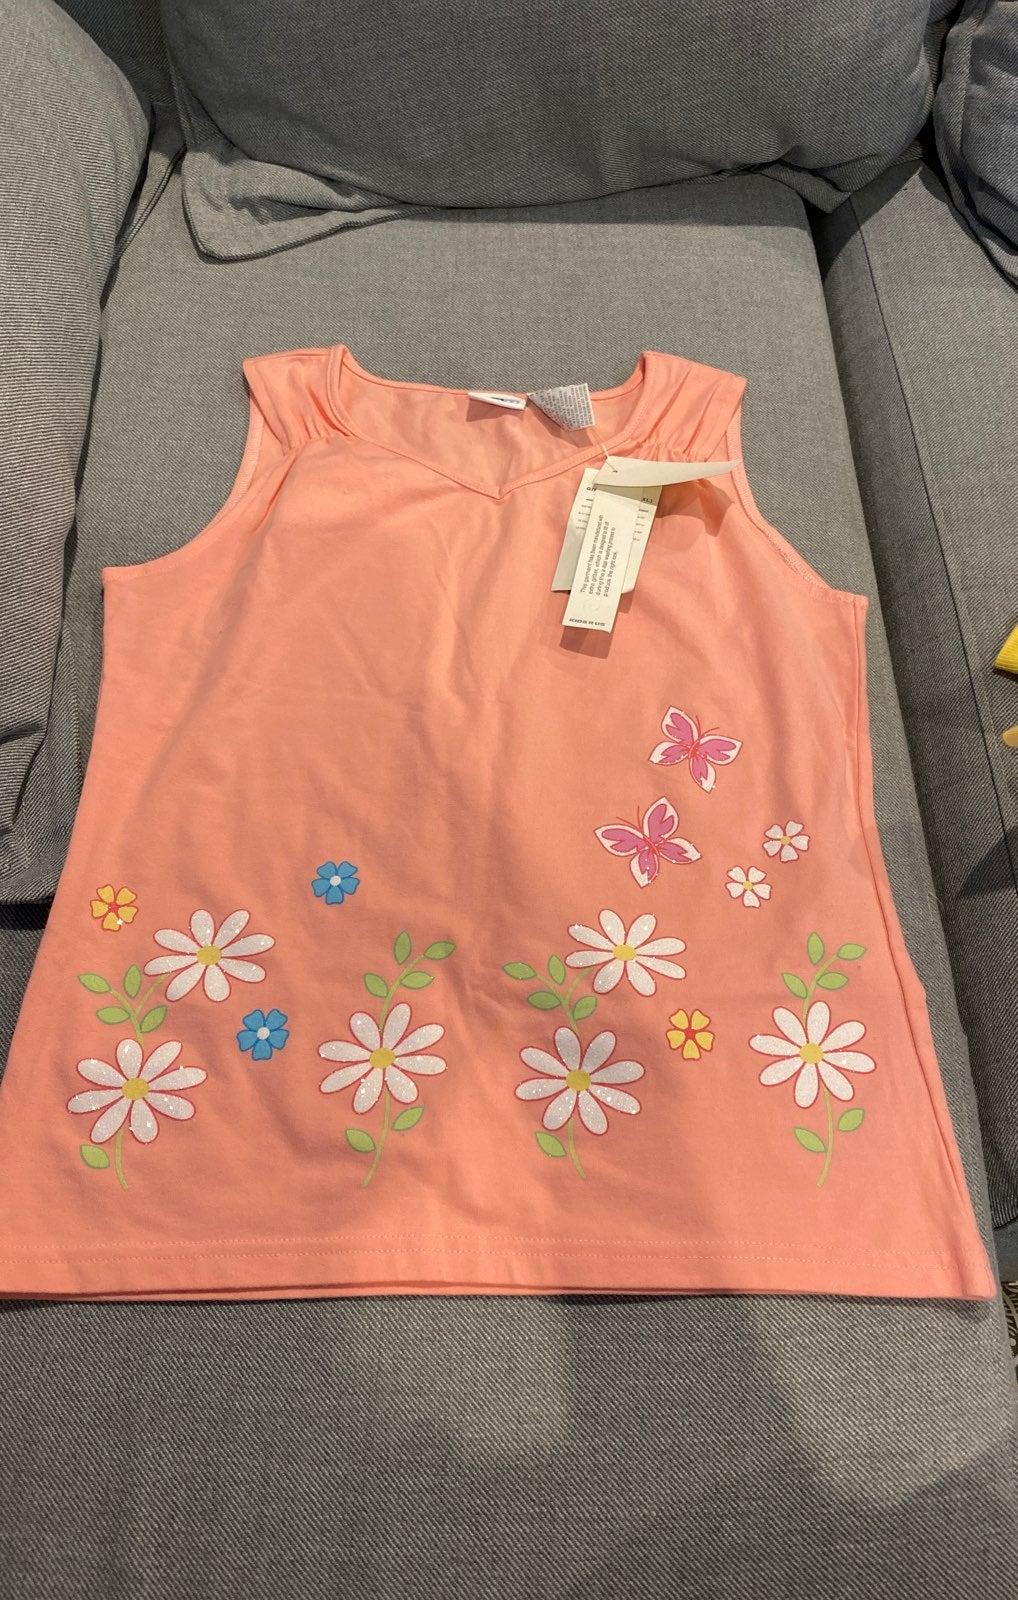 daisy flower and butterfly tank shirt